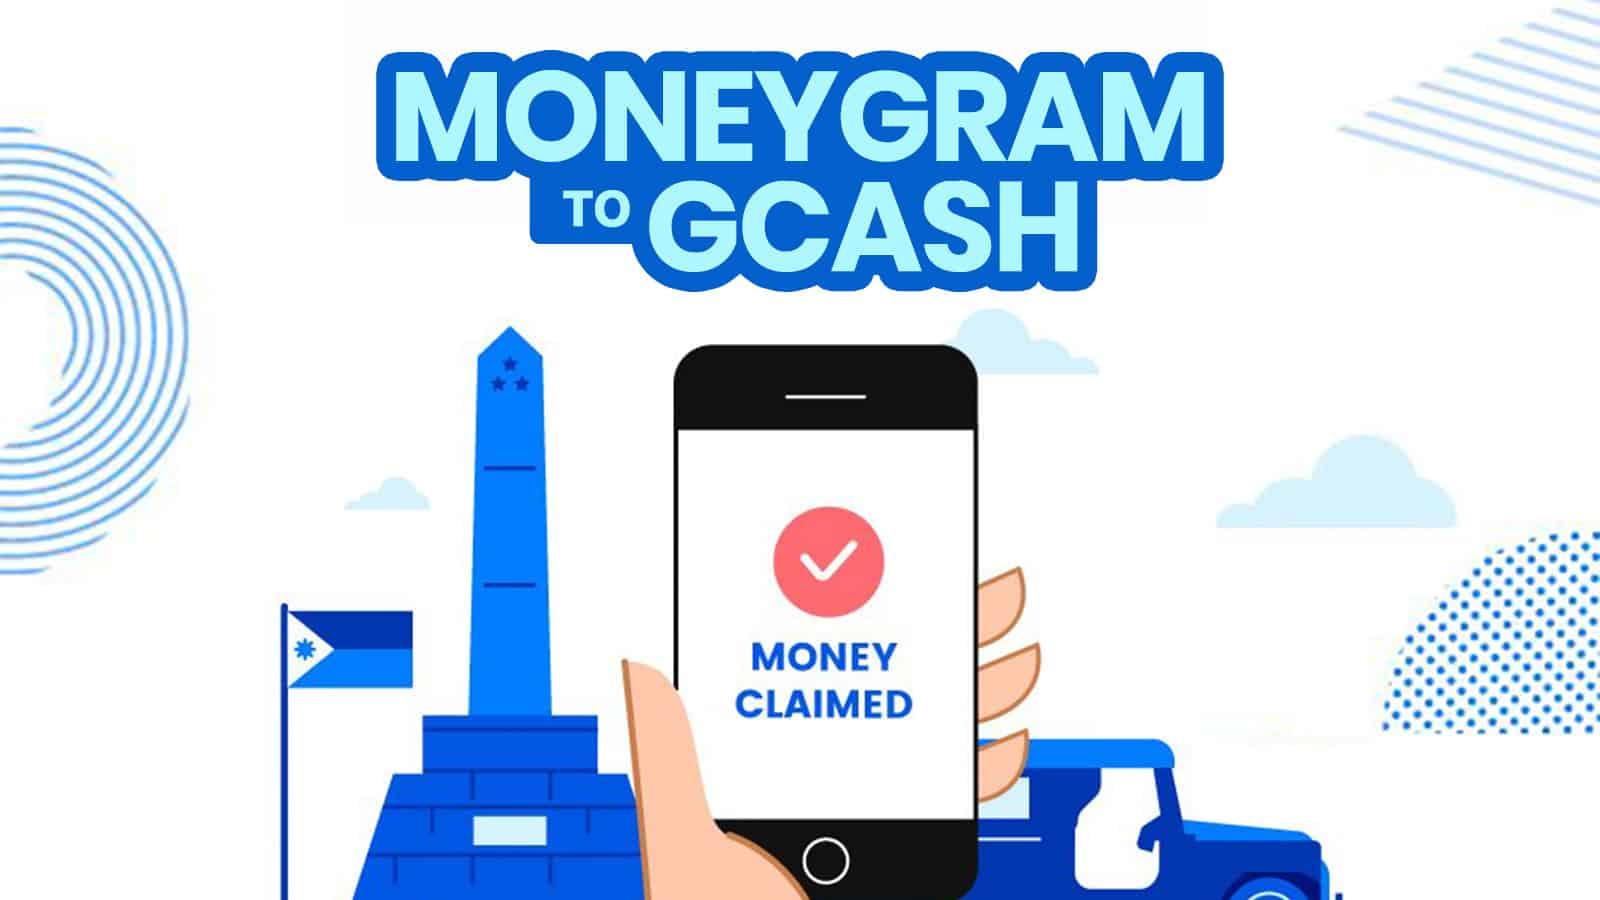 MONEYGRAM TO GCASH: How to Receive Money or Cash In Using GCASH App